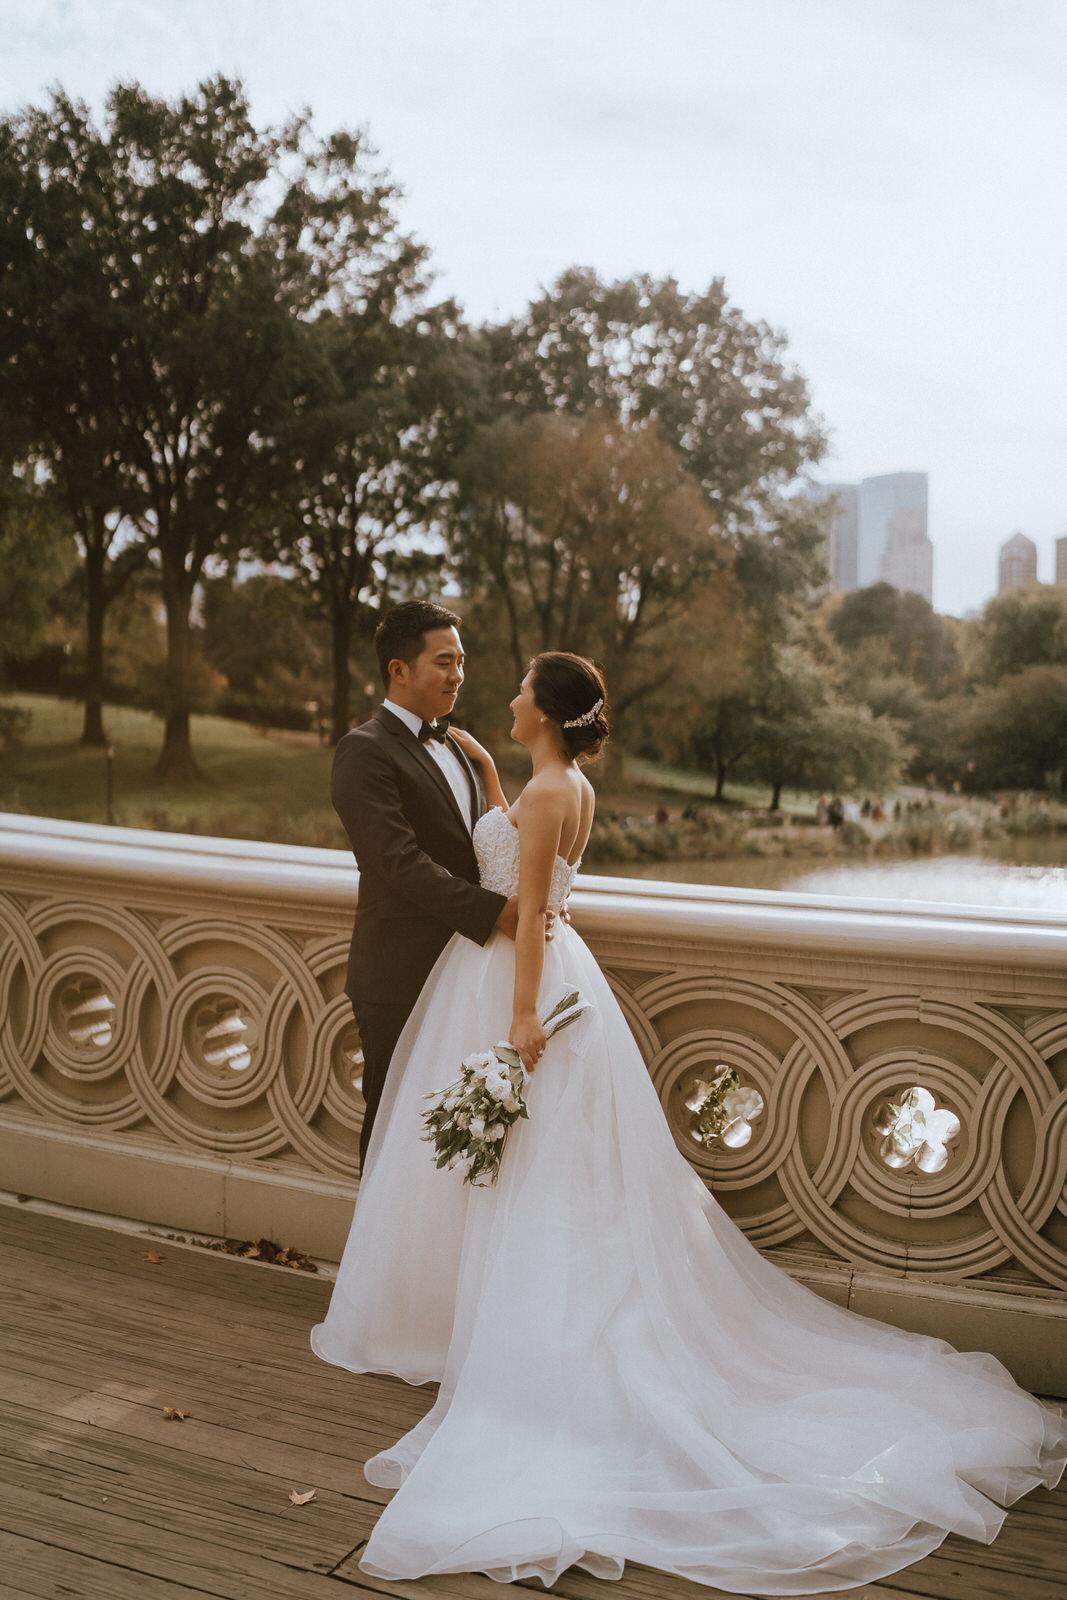 Central Park Elopement Photos-Bow Bridge-Michelle Gonzalez Photography- New York Wedding Photographer-17.jpg